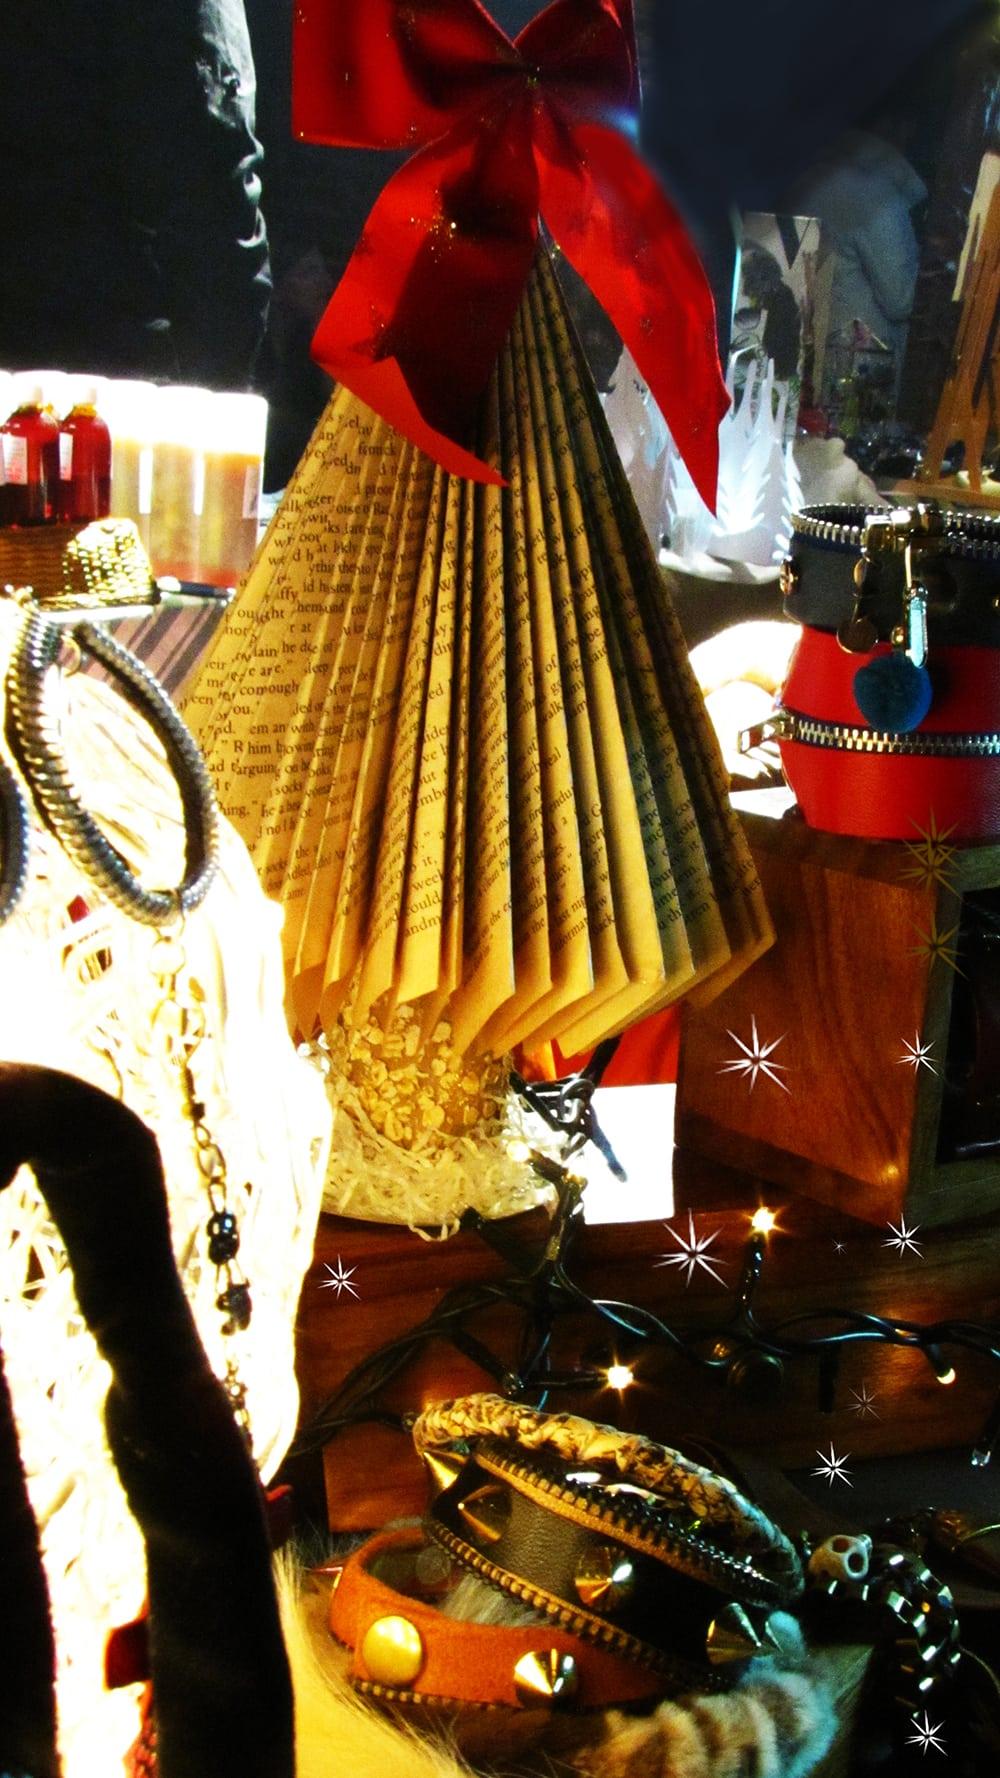 Santa Goodies, από την PillBOX – Ο Άγιος Βασίλης, φέτος, έρχεται νωρίς!